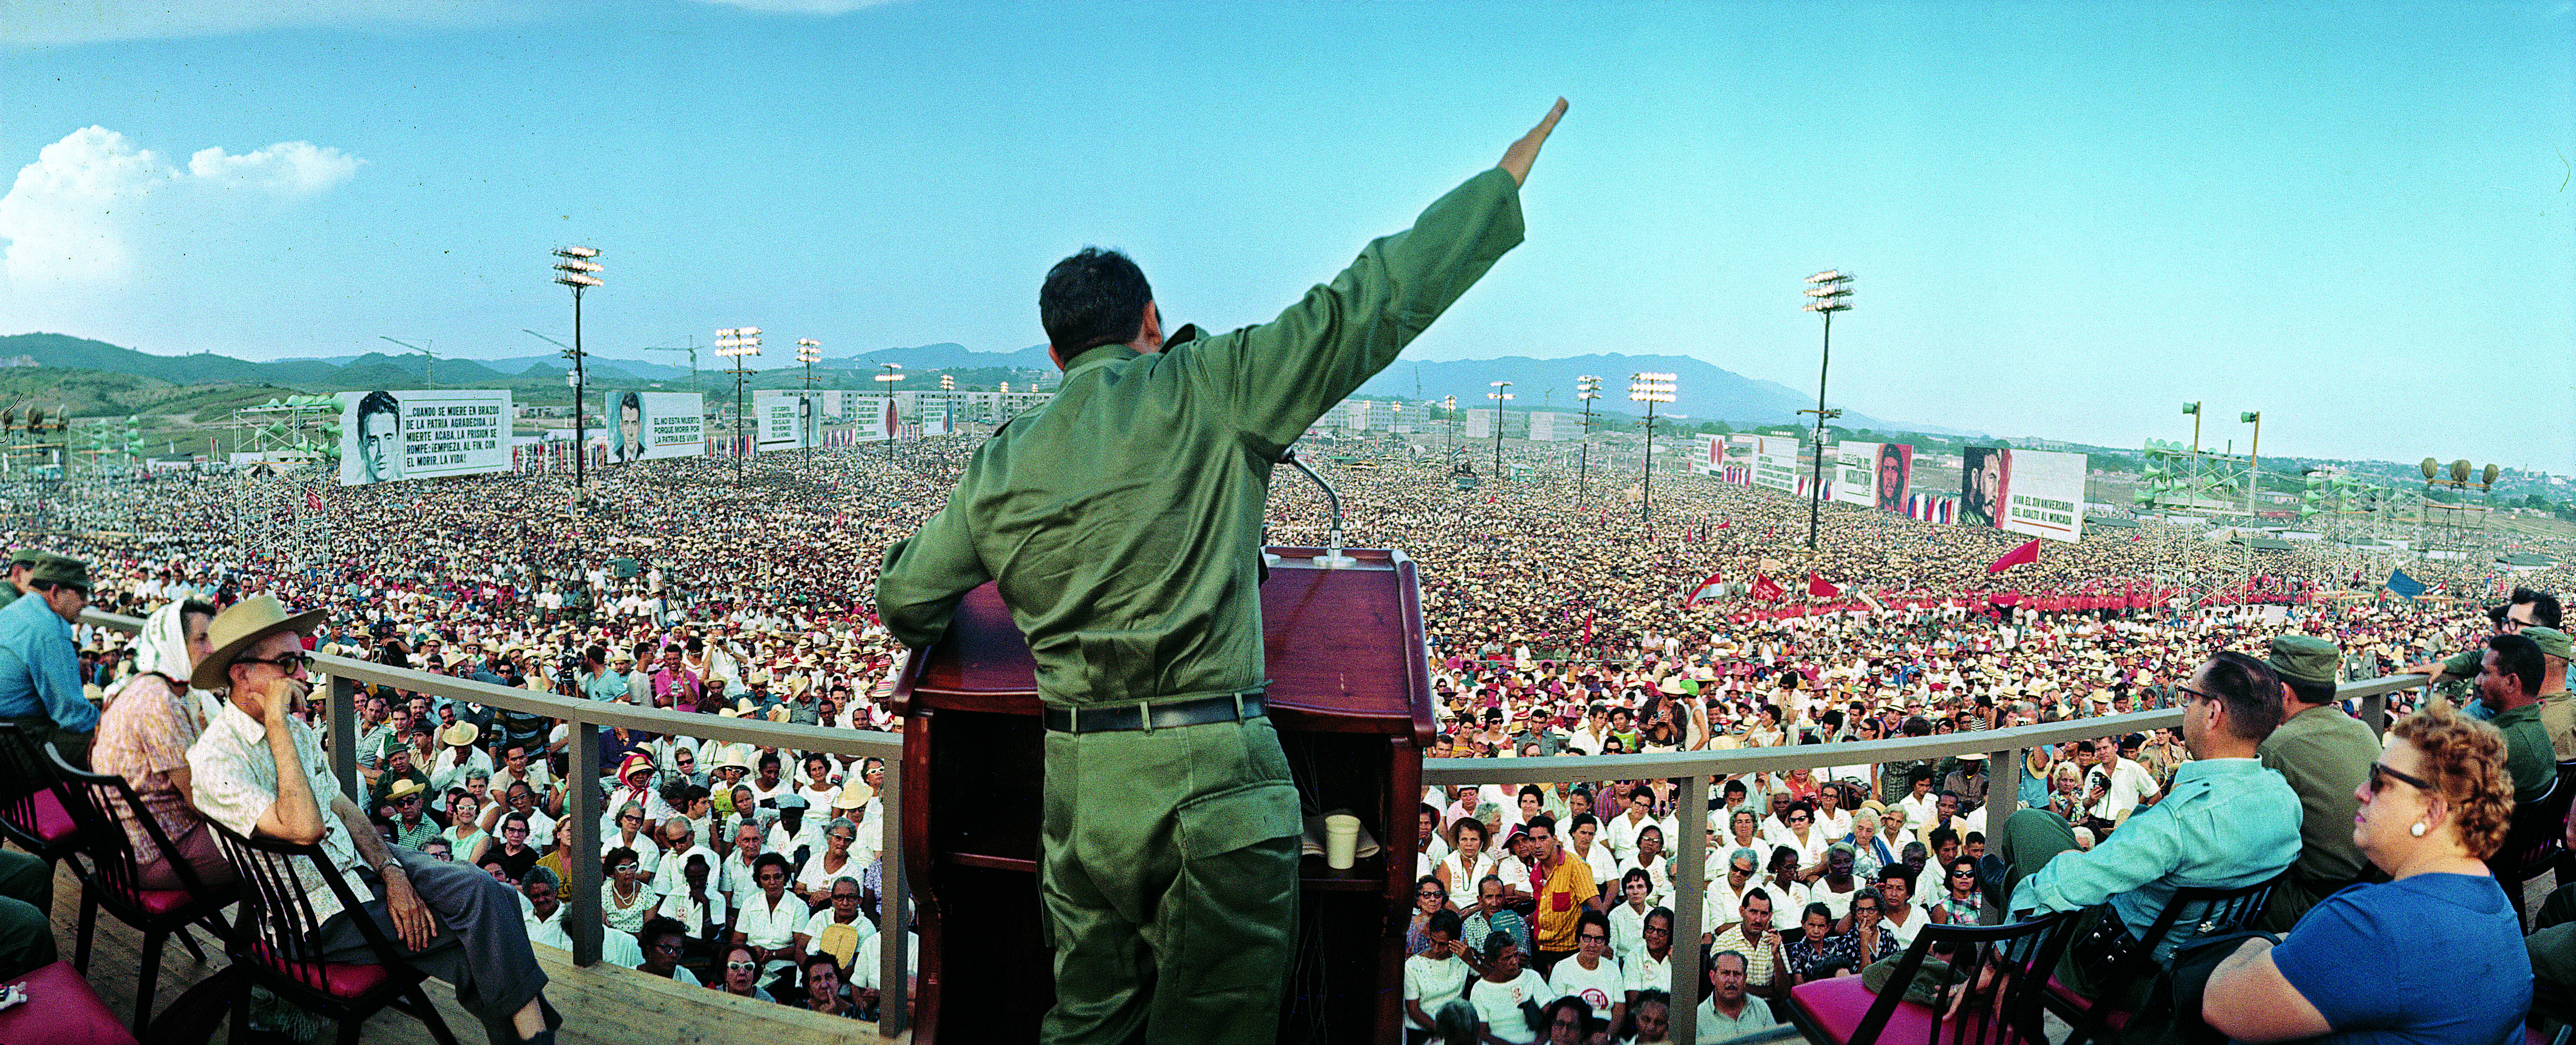 Cuba's Founding Father #Cuba #fidelcastro #90RazonesPorFidel #90Cumpleaños #FidelCastro #culture #history #stories #cubans #biography #rarebooks #writer #monument #monumental